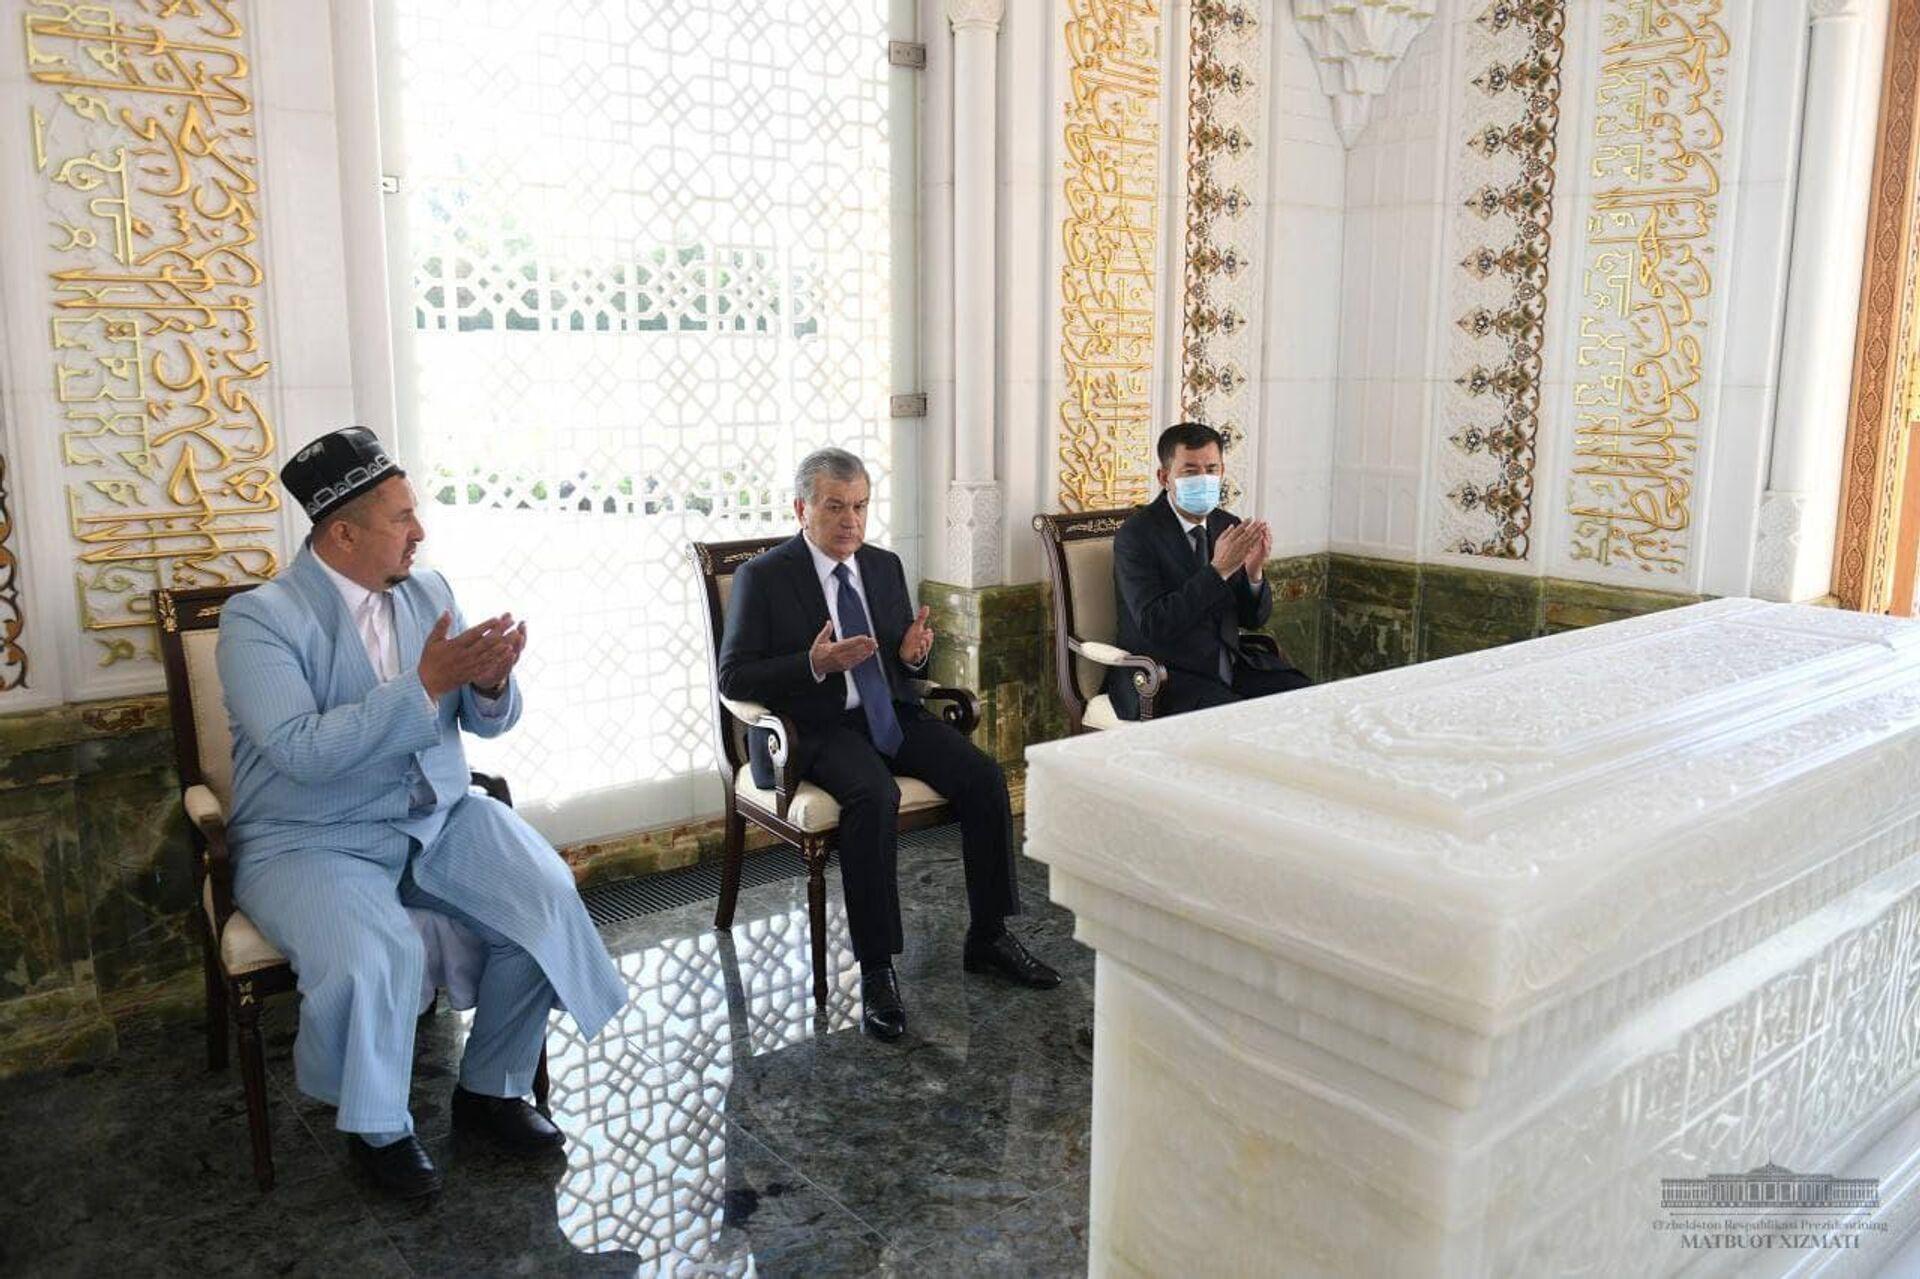 Шавкат Мирзиёев посетил мавзолей Ислама Каримова в Самарканде - Sputnik Узбекистан, 1920, 24.09.2021